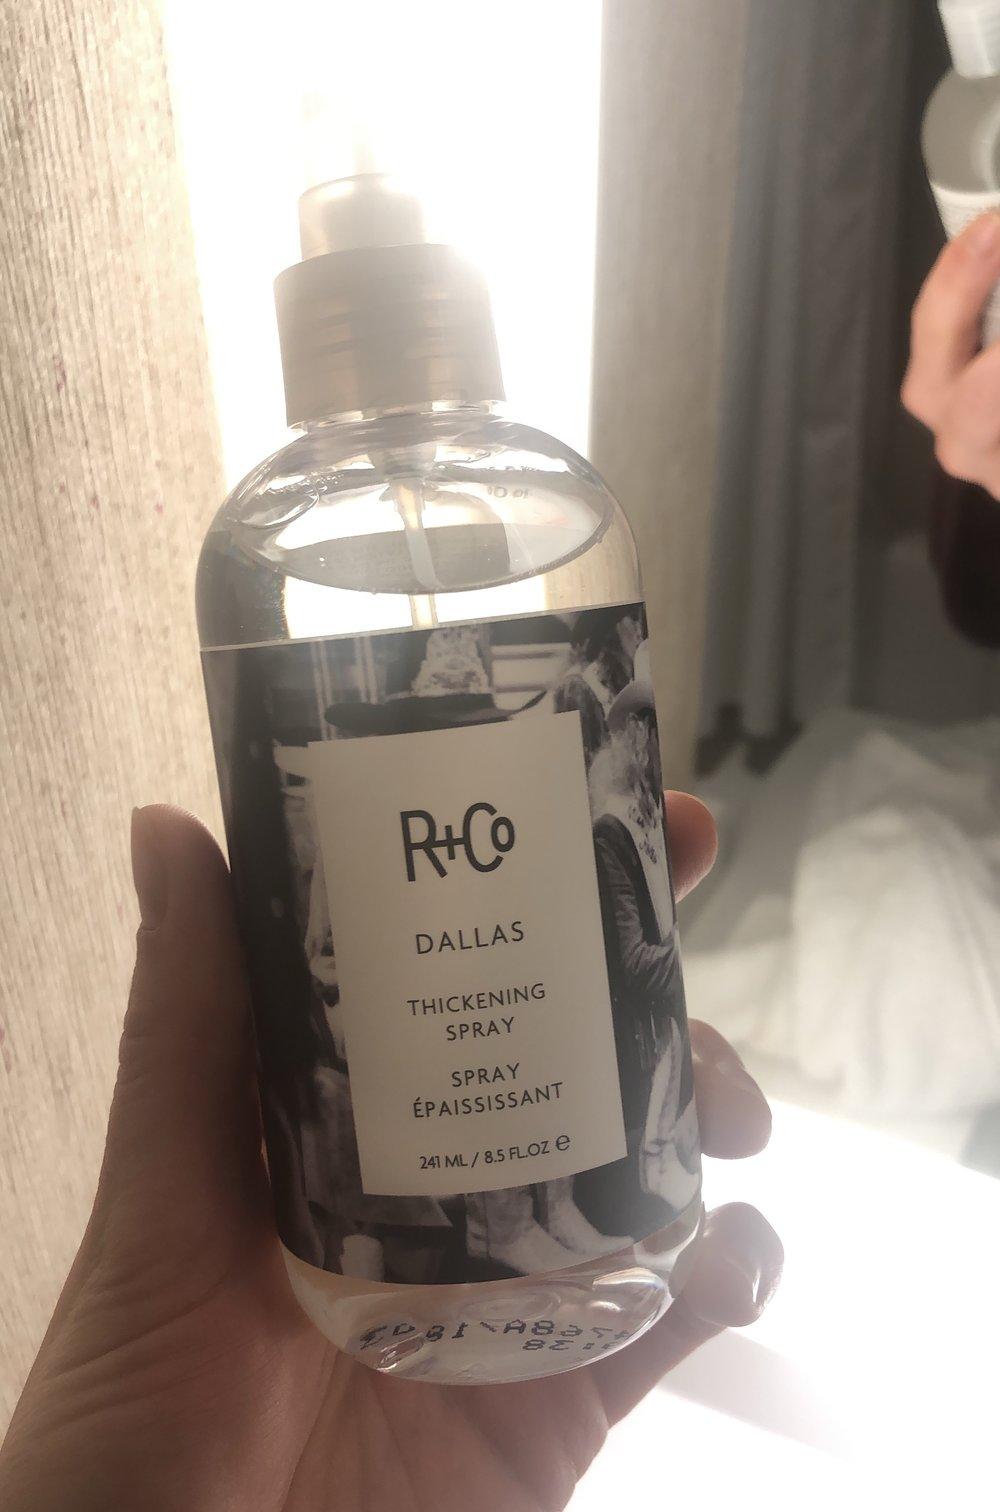 R + Co Dallas Thickening Spray -